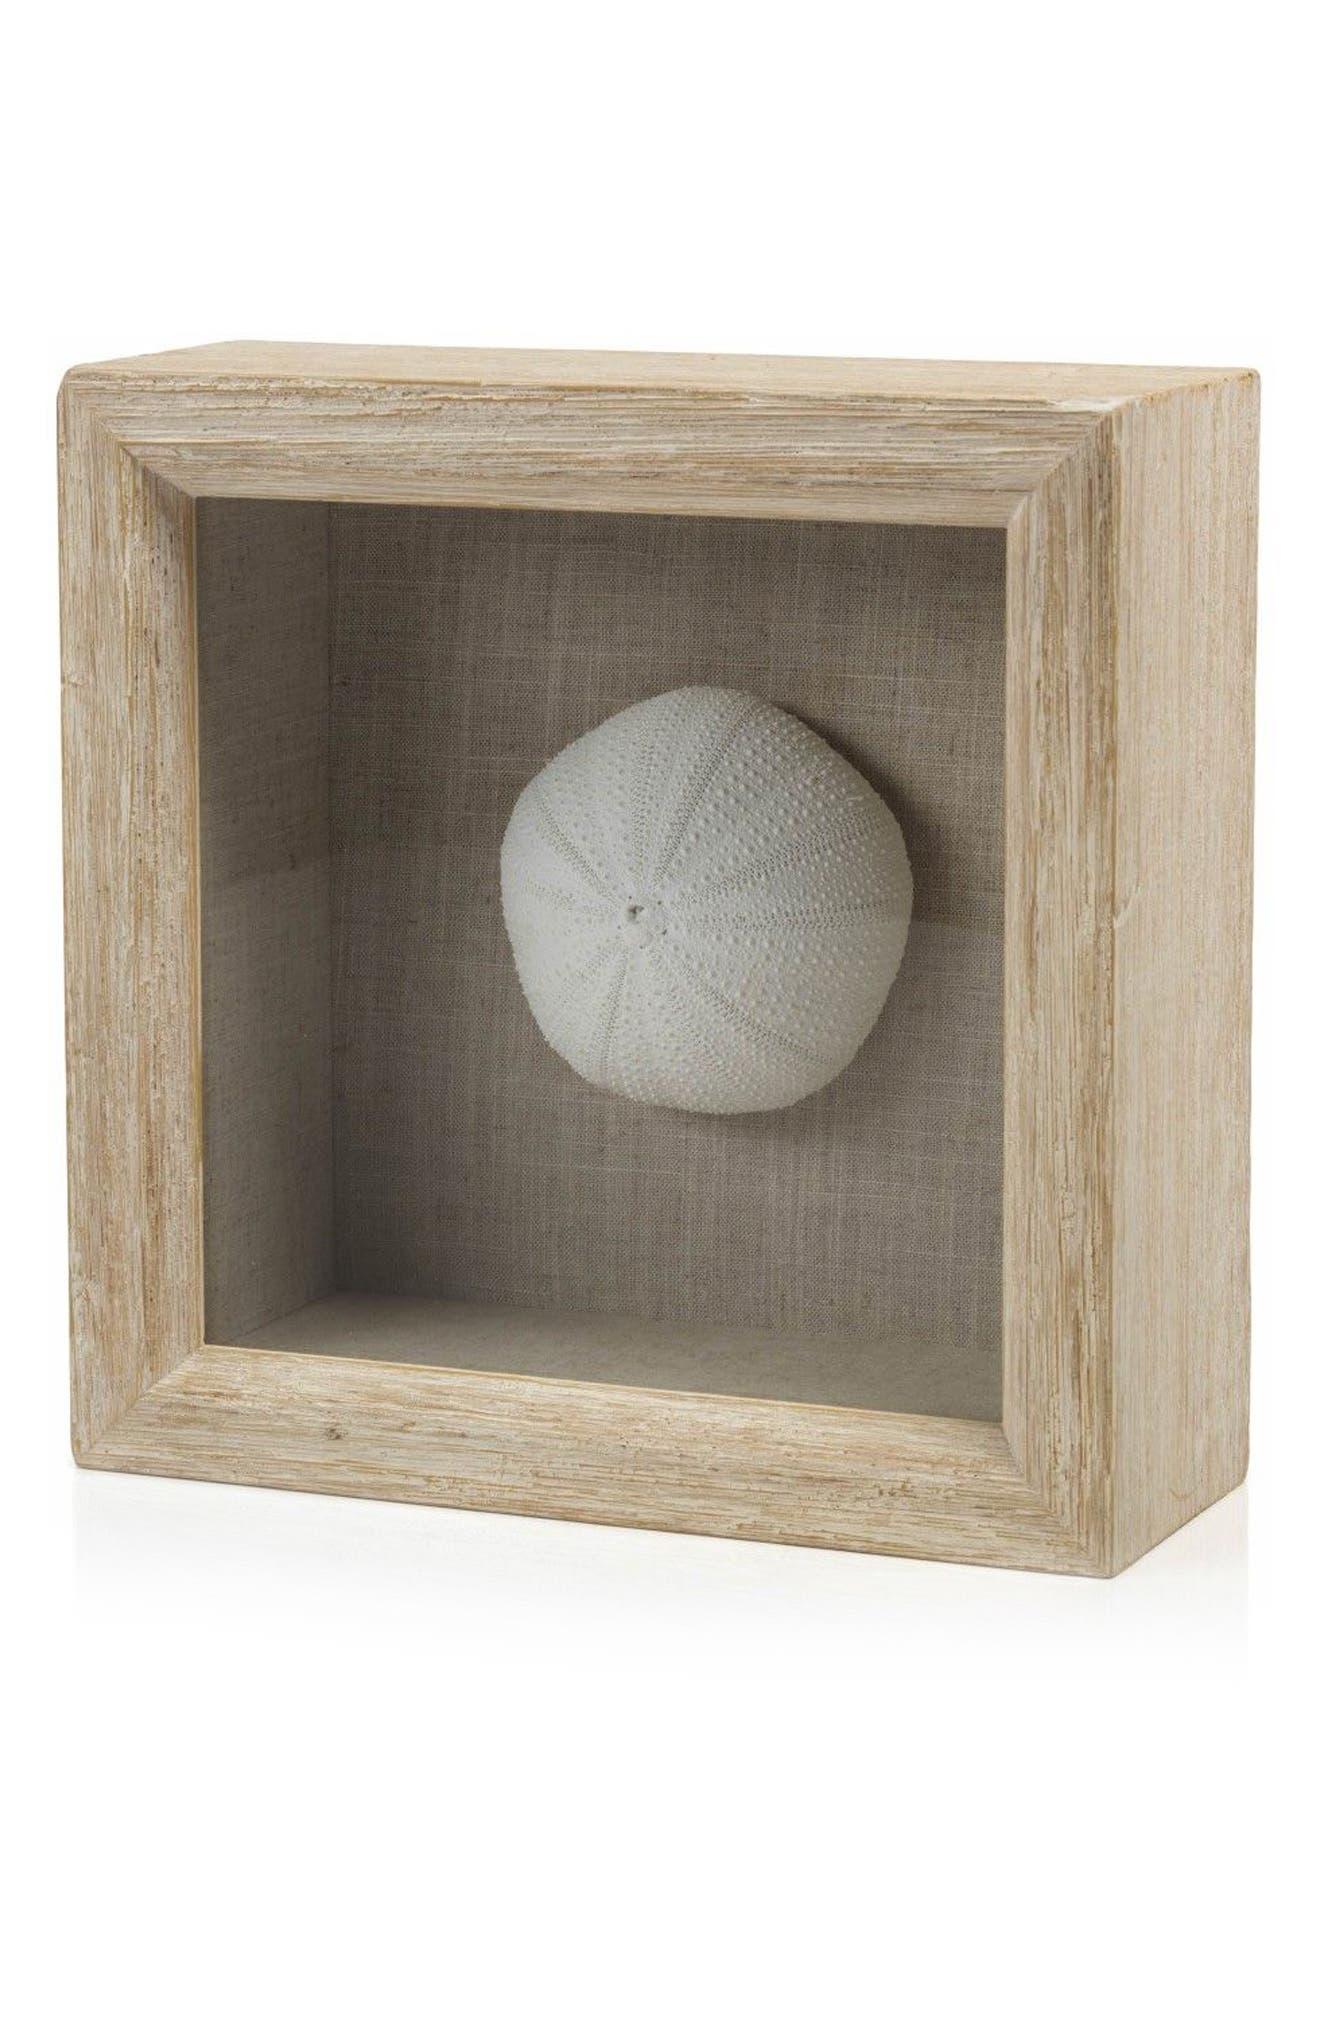 Main Image - Zodax Sea Urchin Shadow Box Art